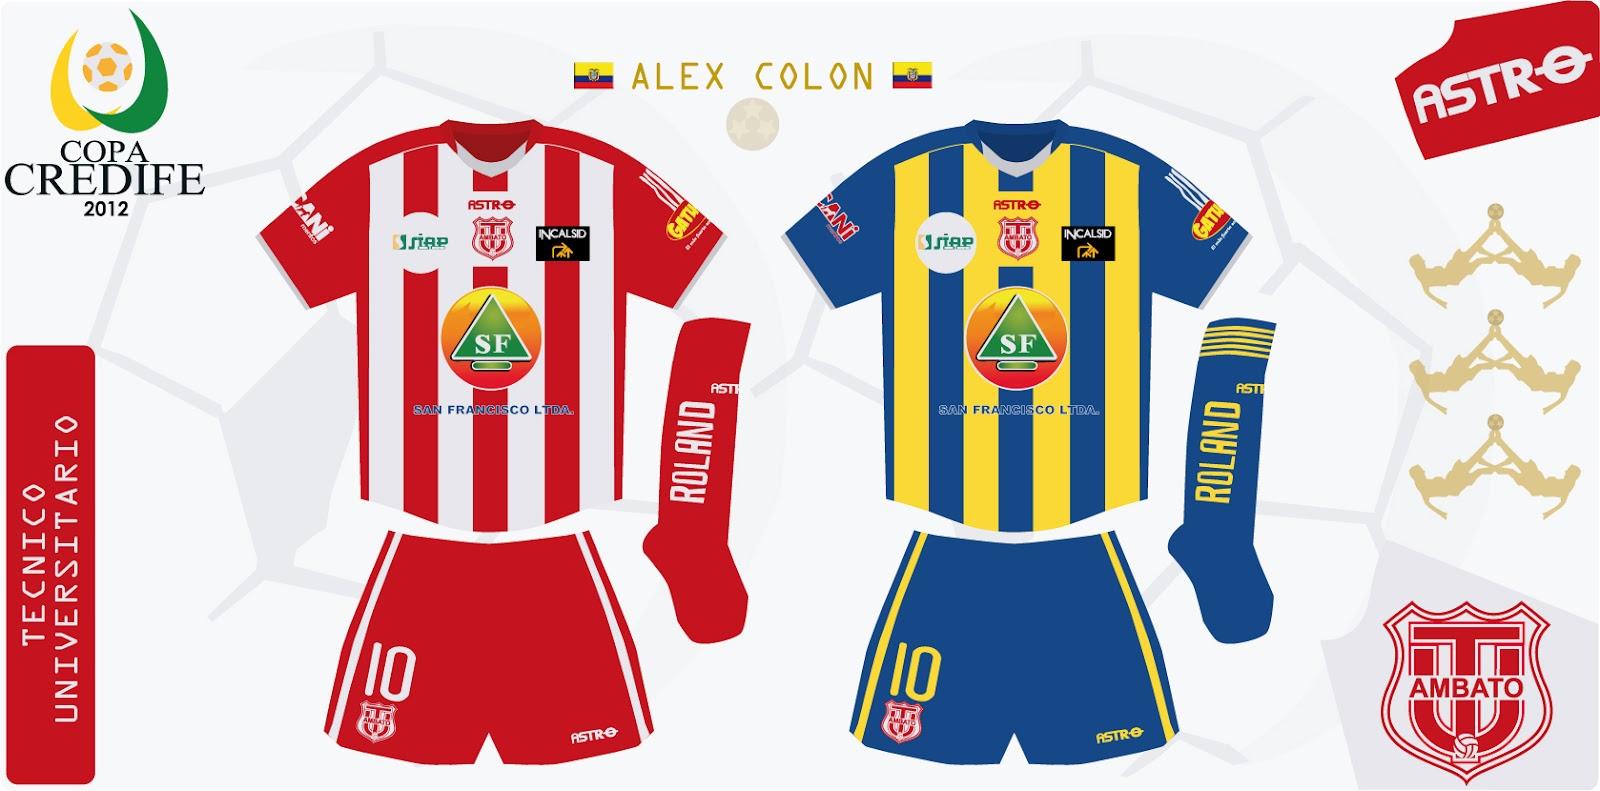 Design futbol kits t cnico universitario 2012 copa credife for Exterior tecnico universitario 2018